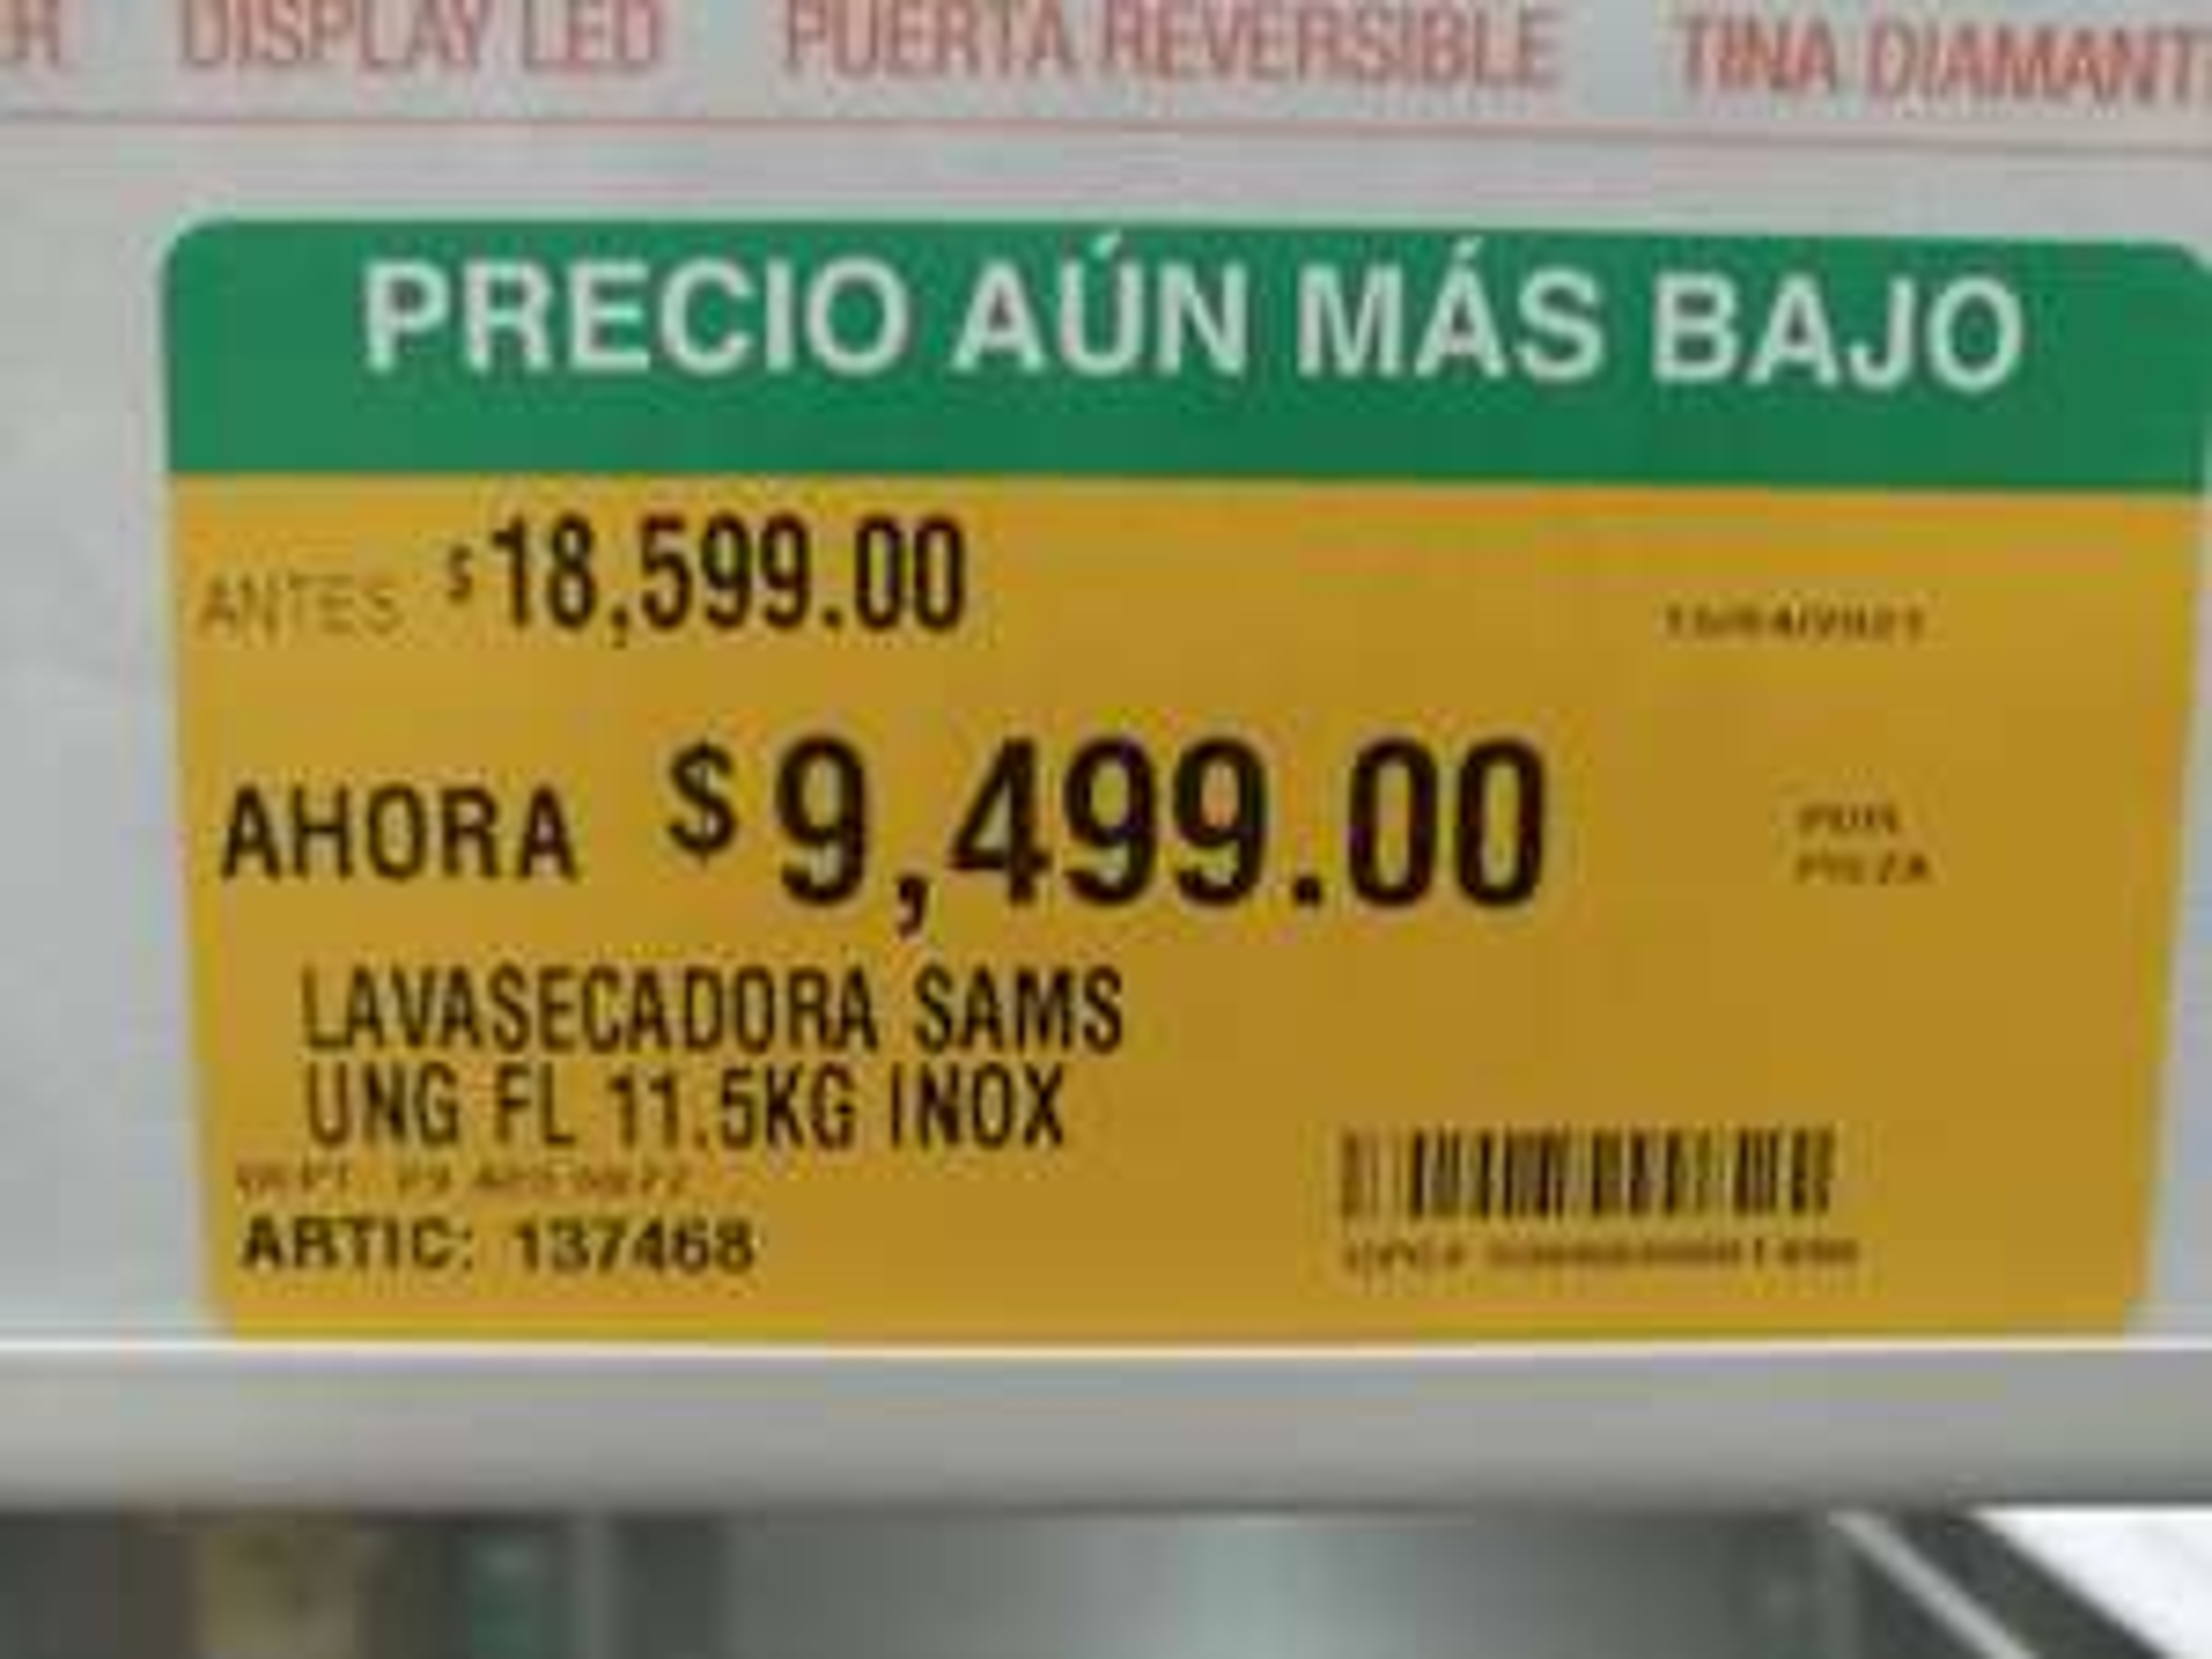 Home Depot: Lavasecadora Samsung 11.5 kg